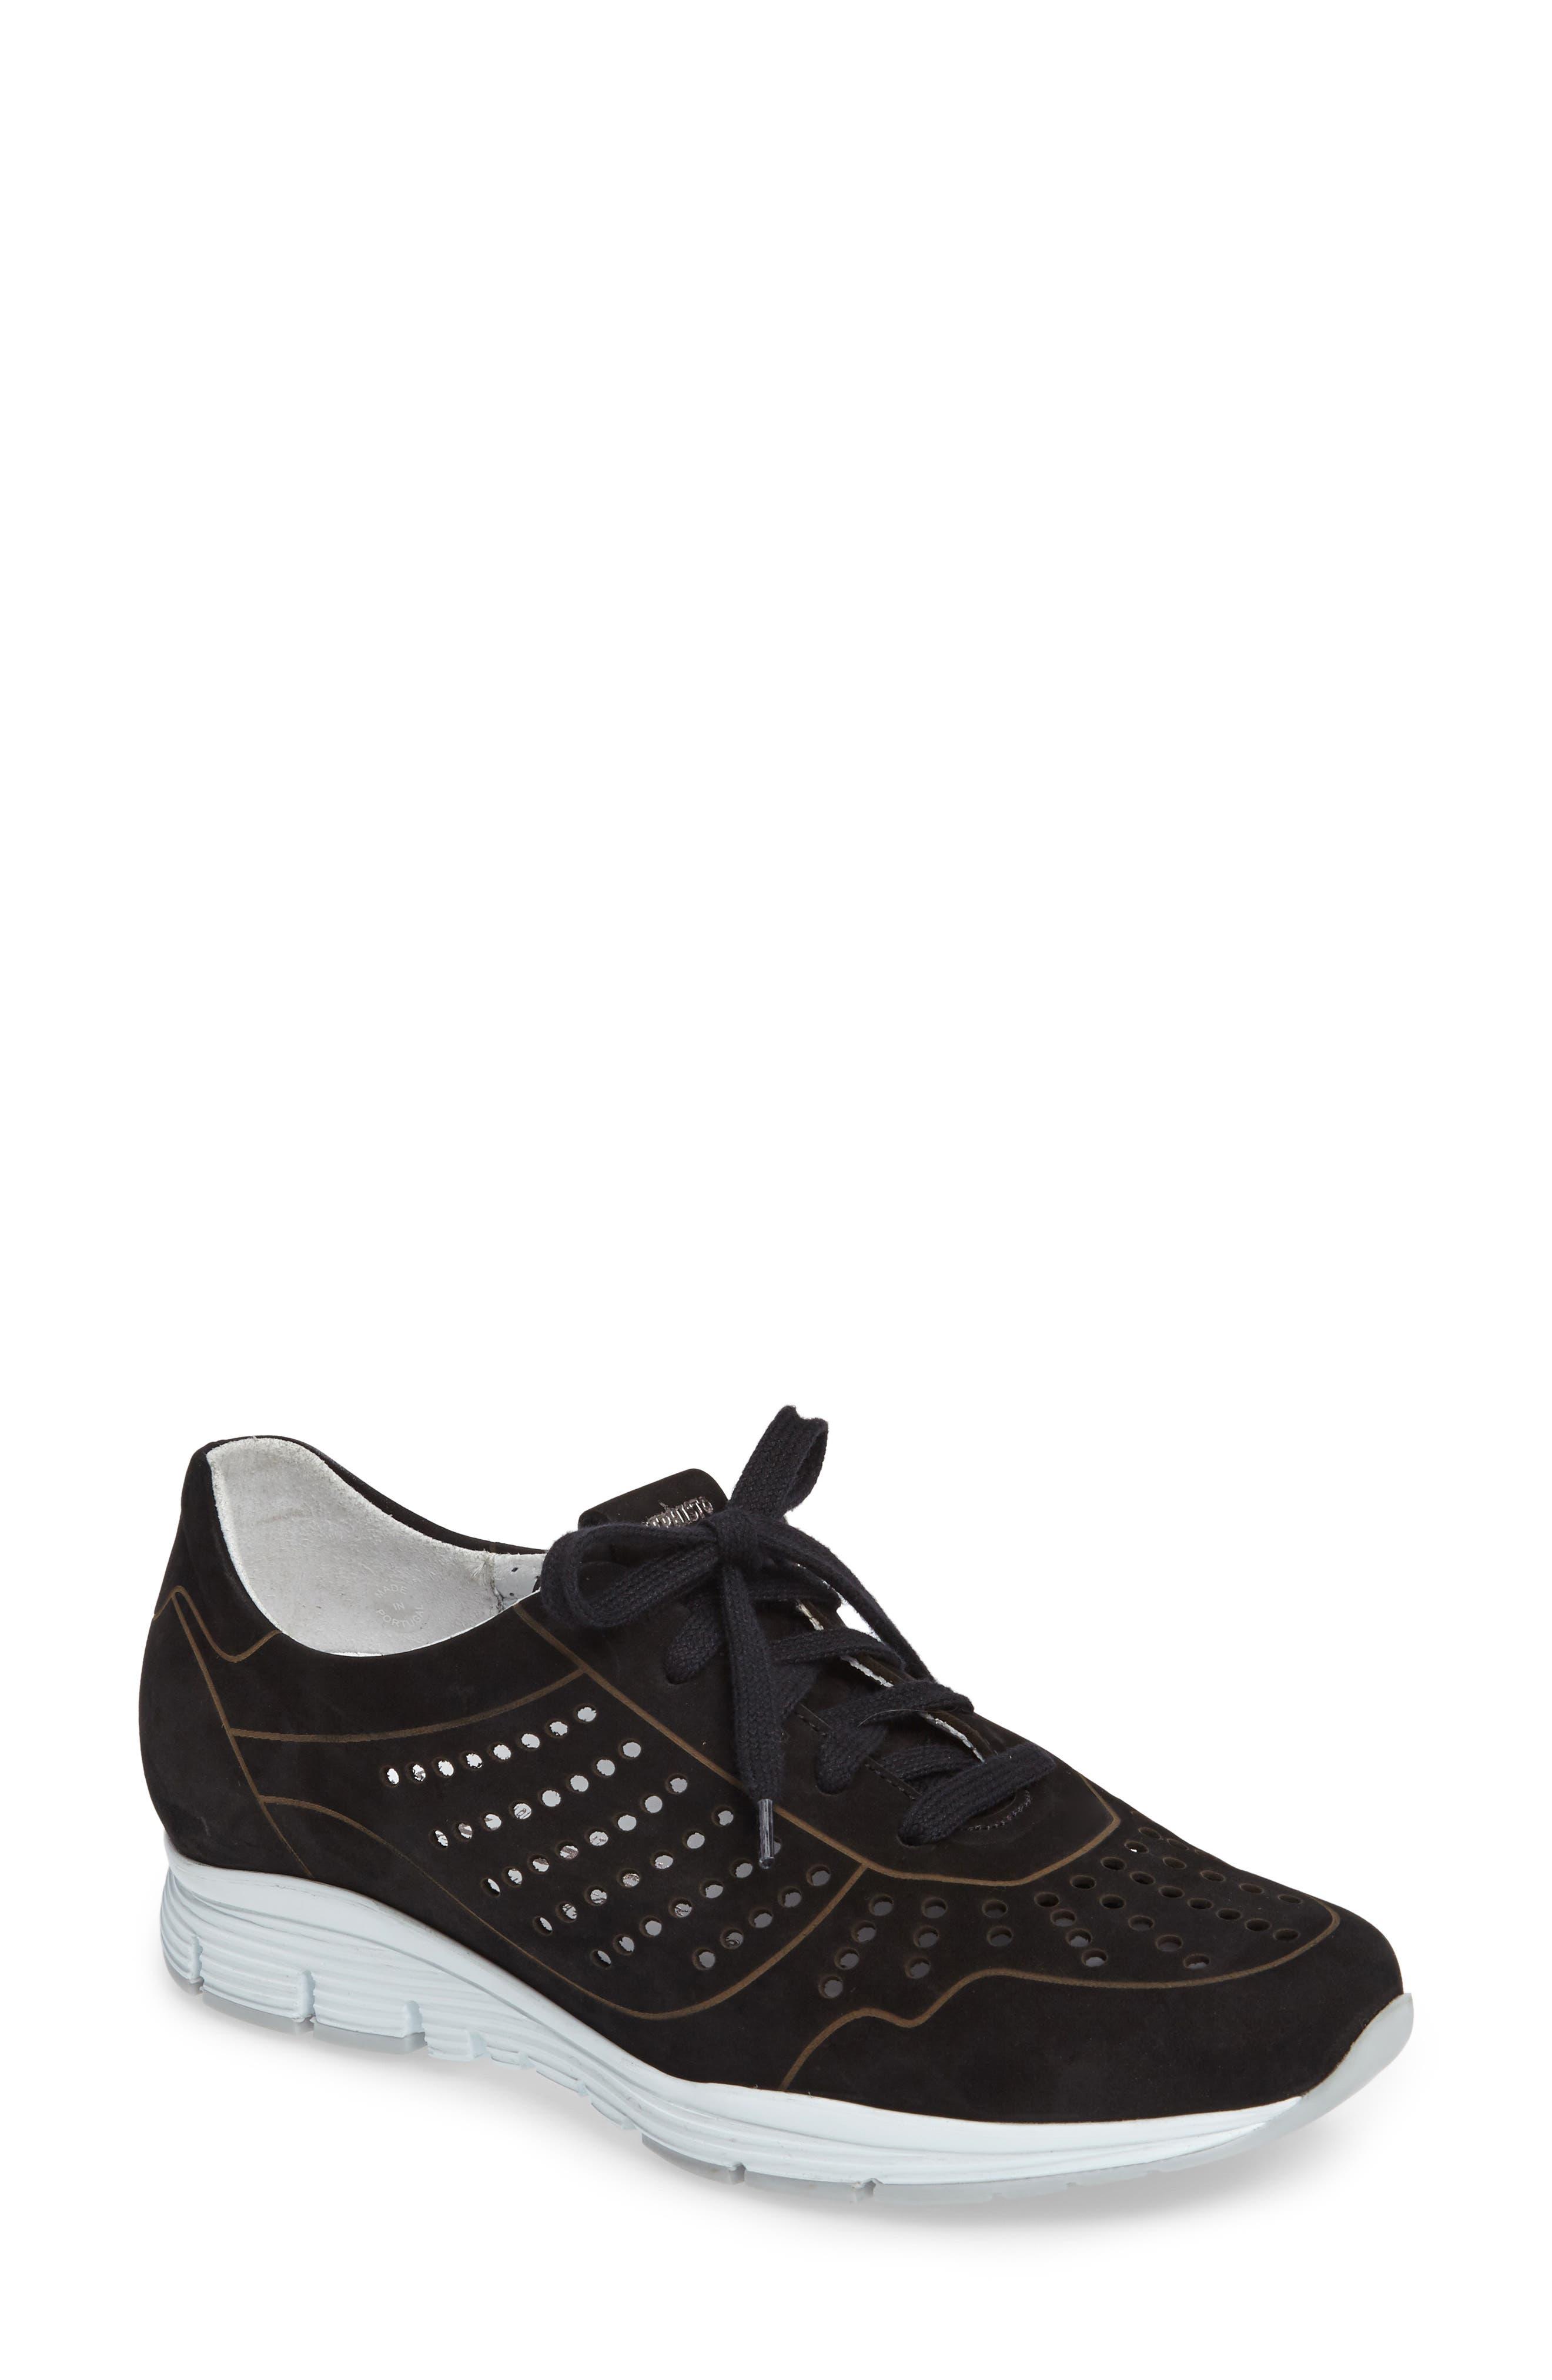 Yliane Sneaker,                         Main,                         color, BLACK NUBUCK LEATHER